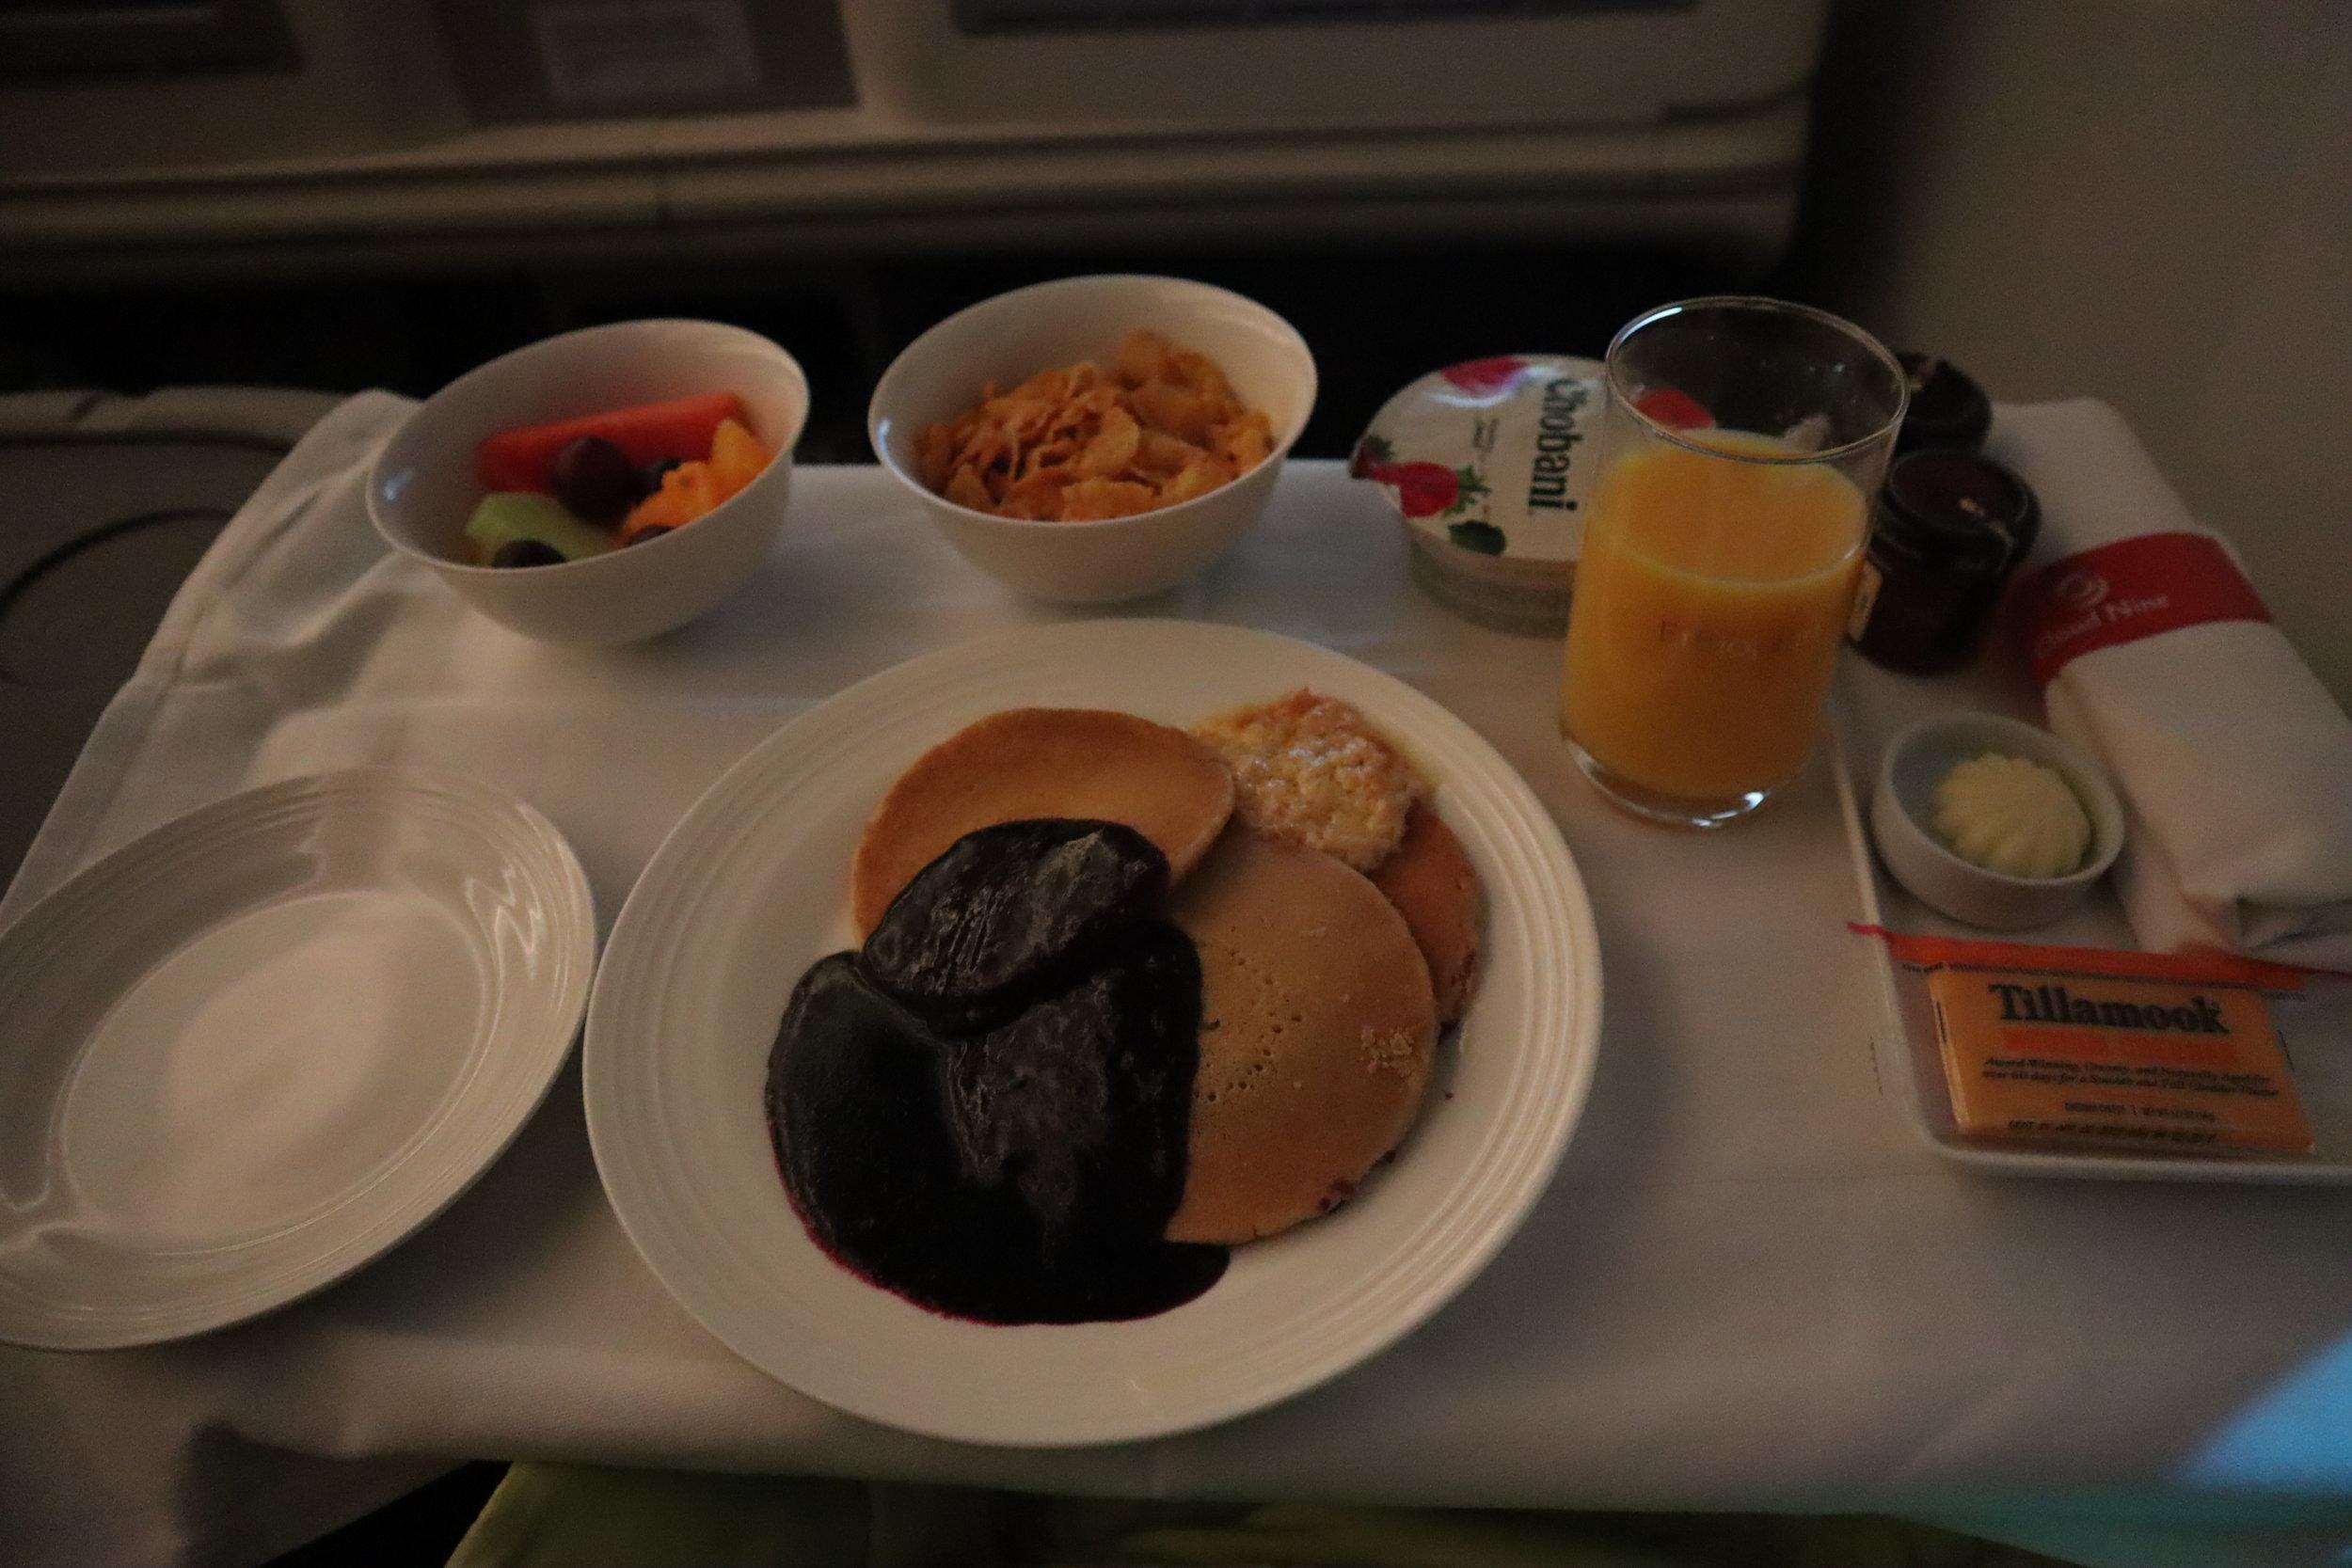 Ethiopian Airlines business class – Breakfast